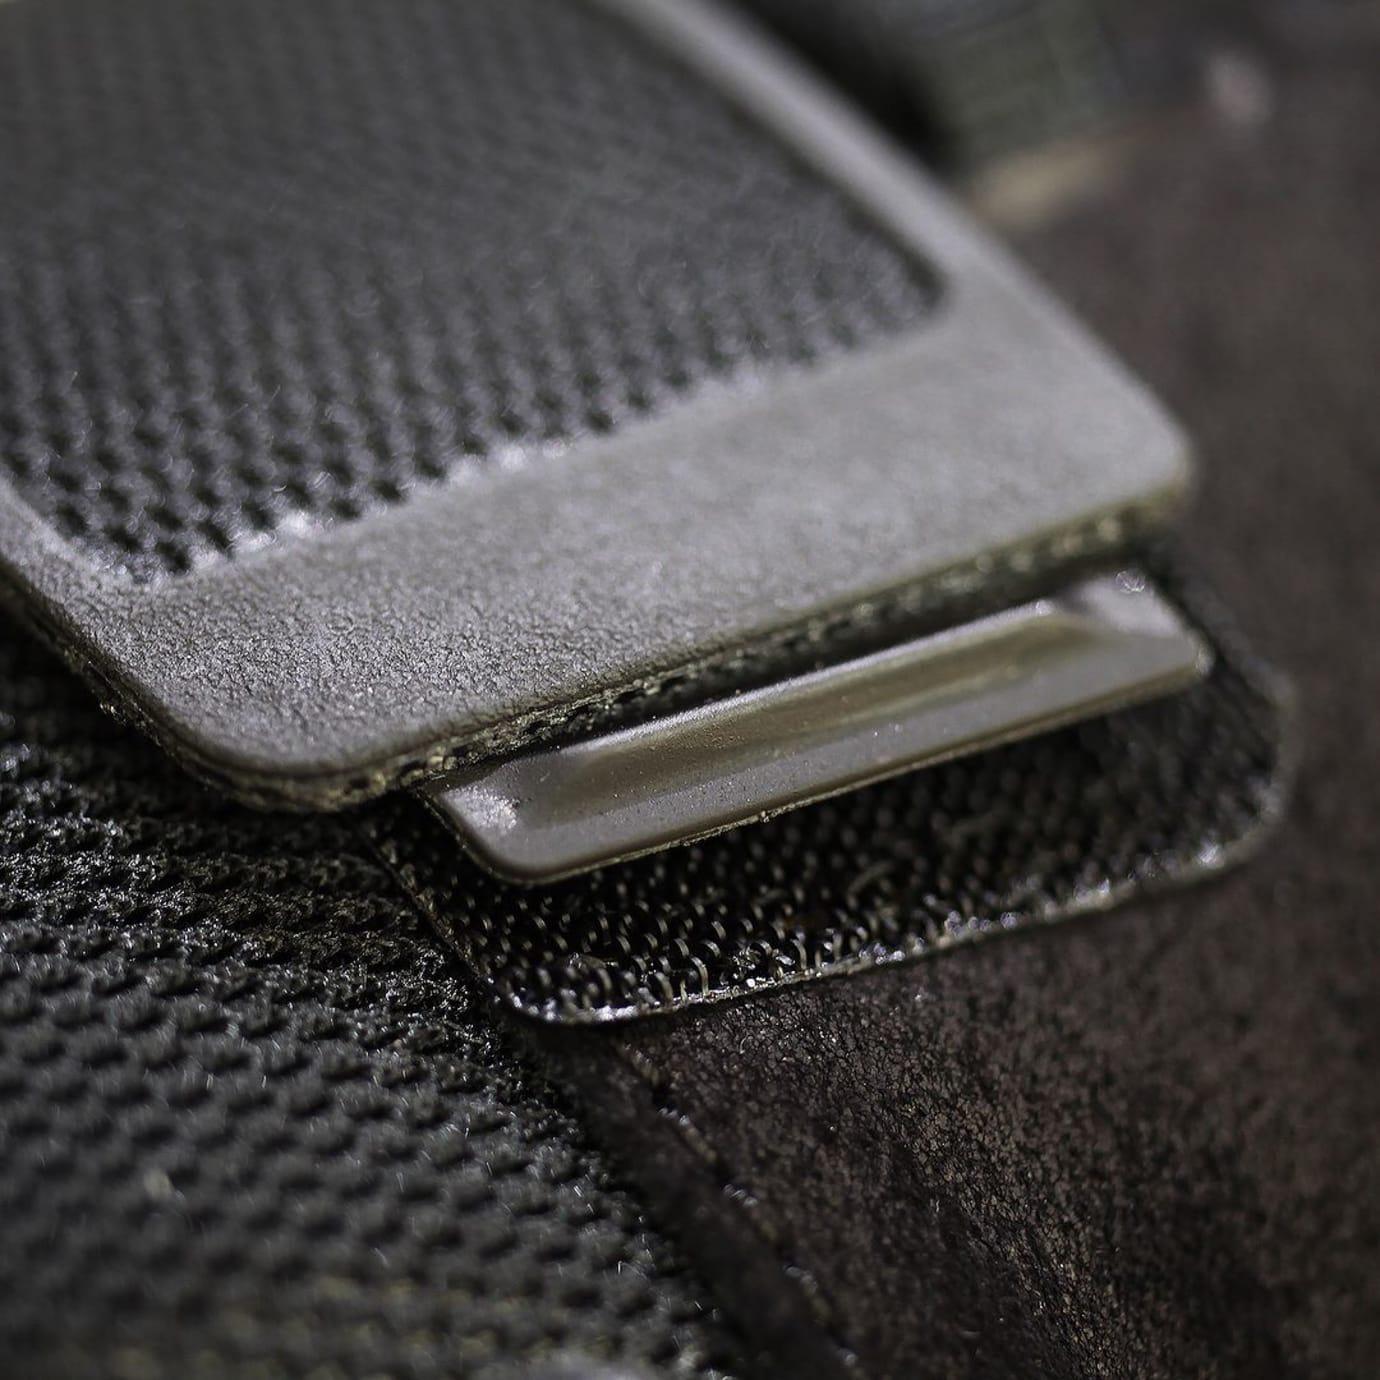 Nike PG1 Black Gum Release Date 878627-004 (13)